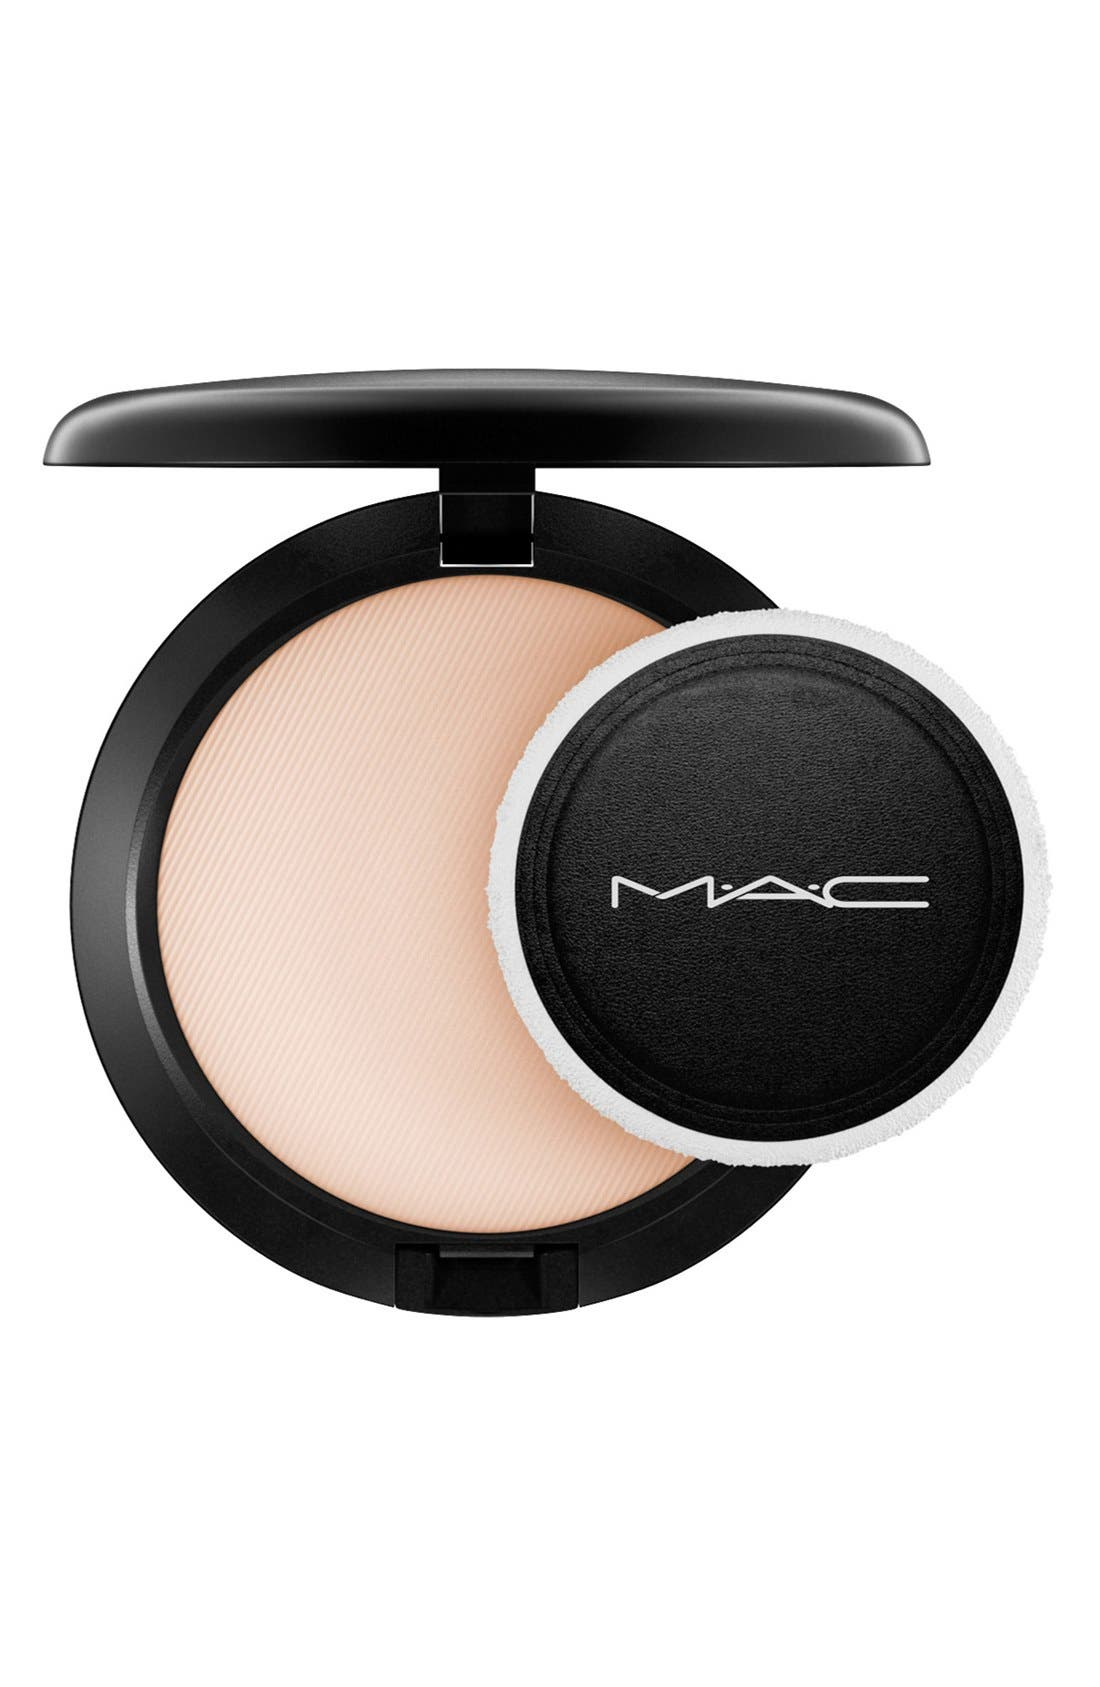 MAC Blot Powder/Pressed